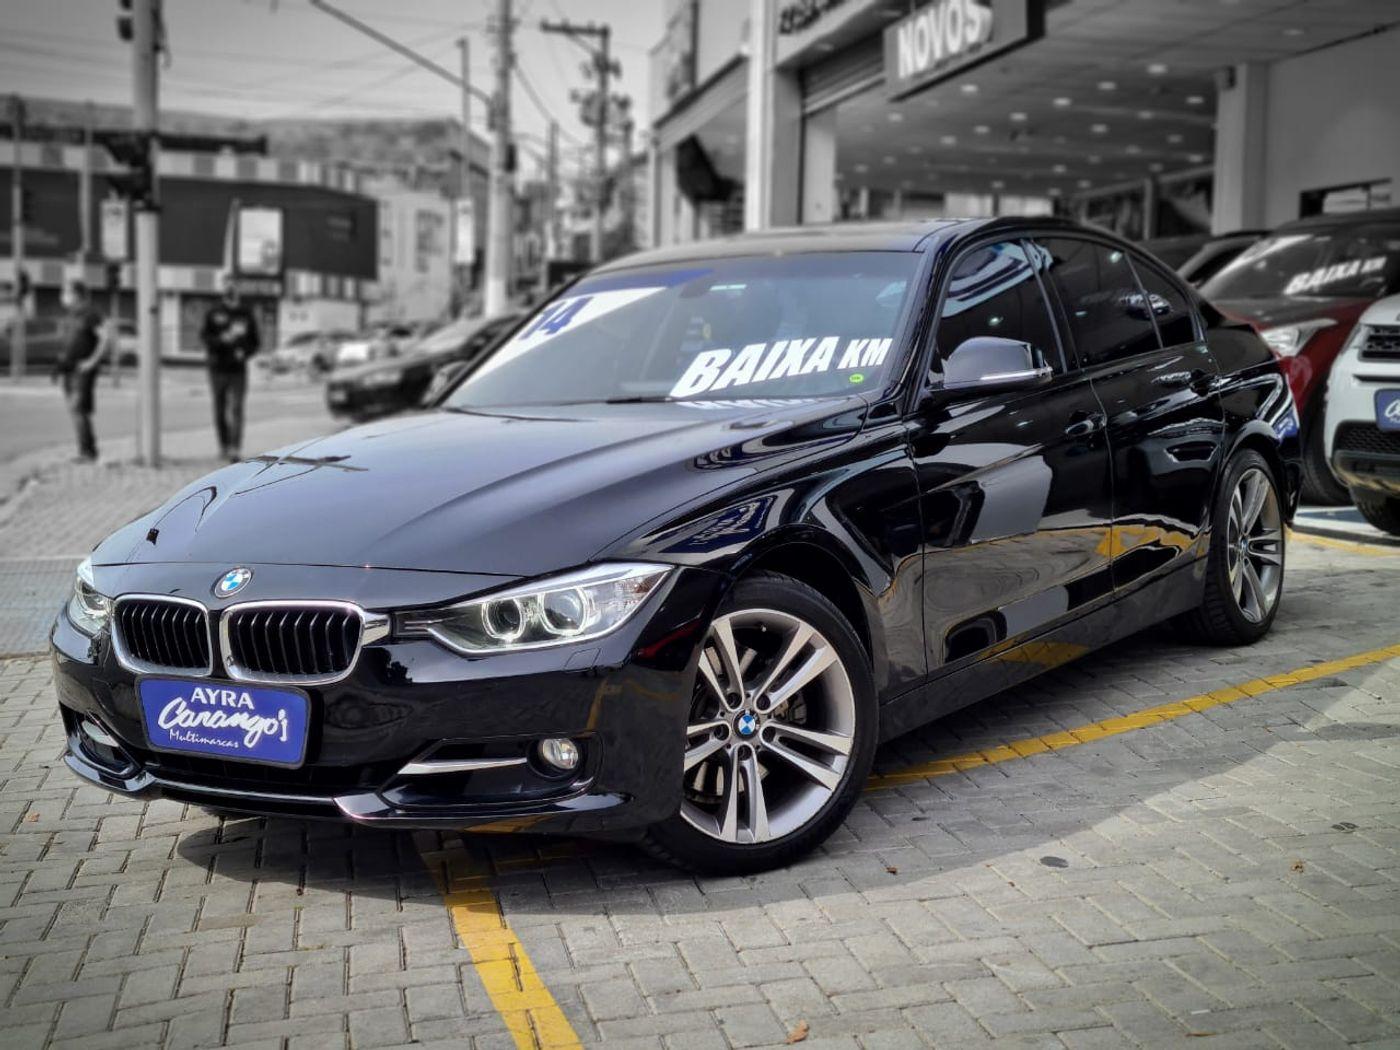 BMW 328iA 2.0 TB/2.0 TB Flex 16V 4p